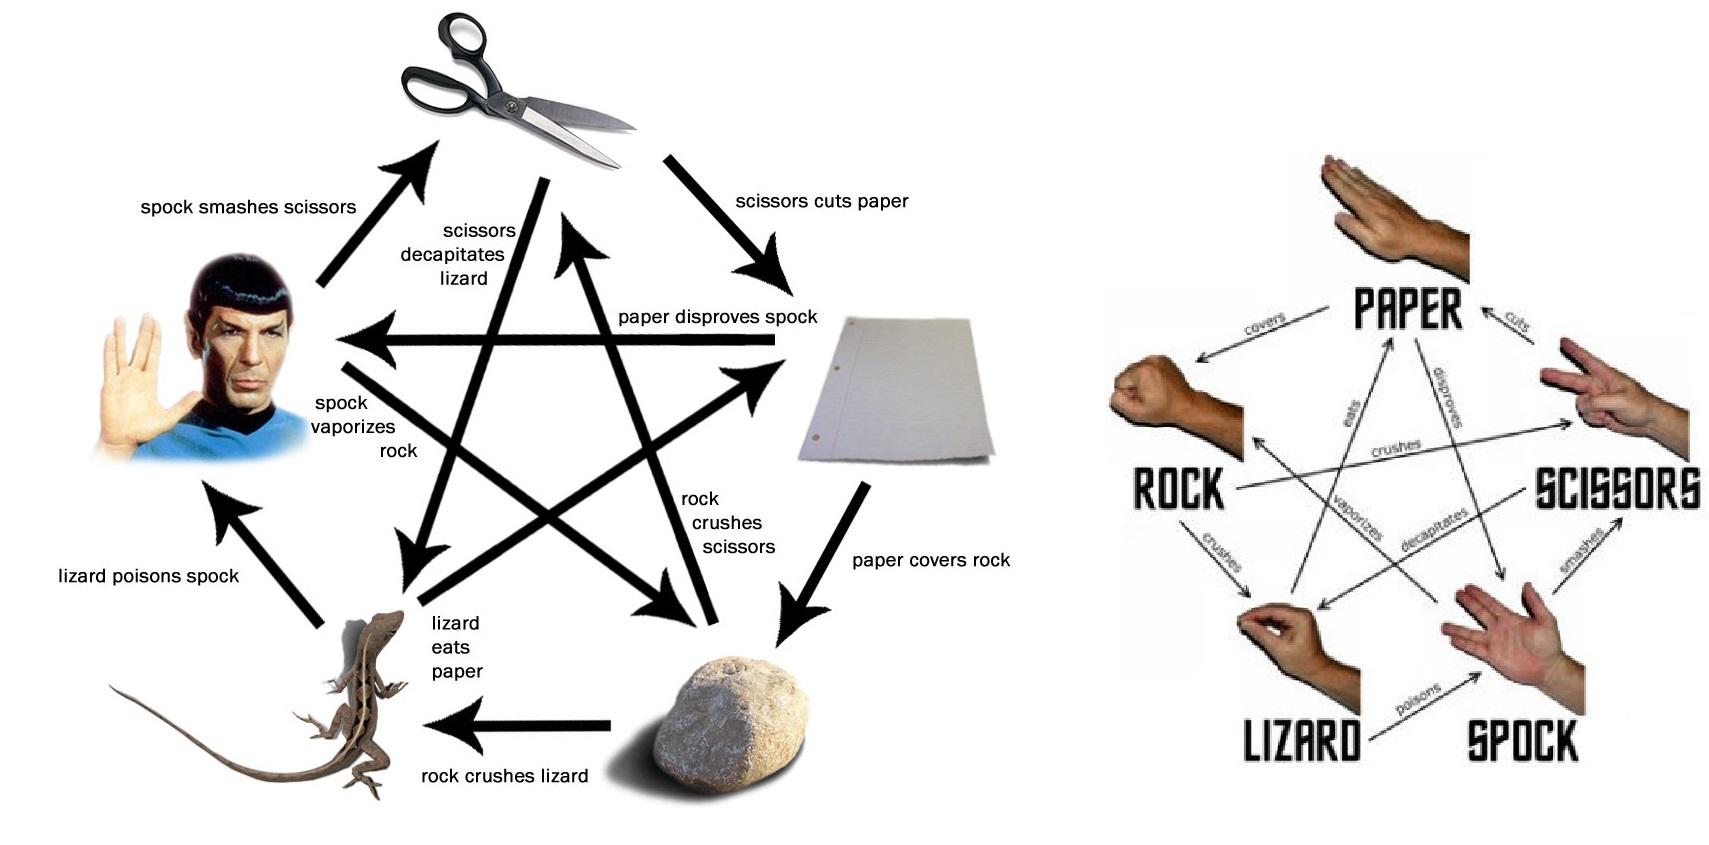 rockpaperscissorslizardspock_by_iamthemiggy.jpg